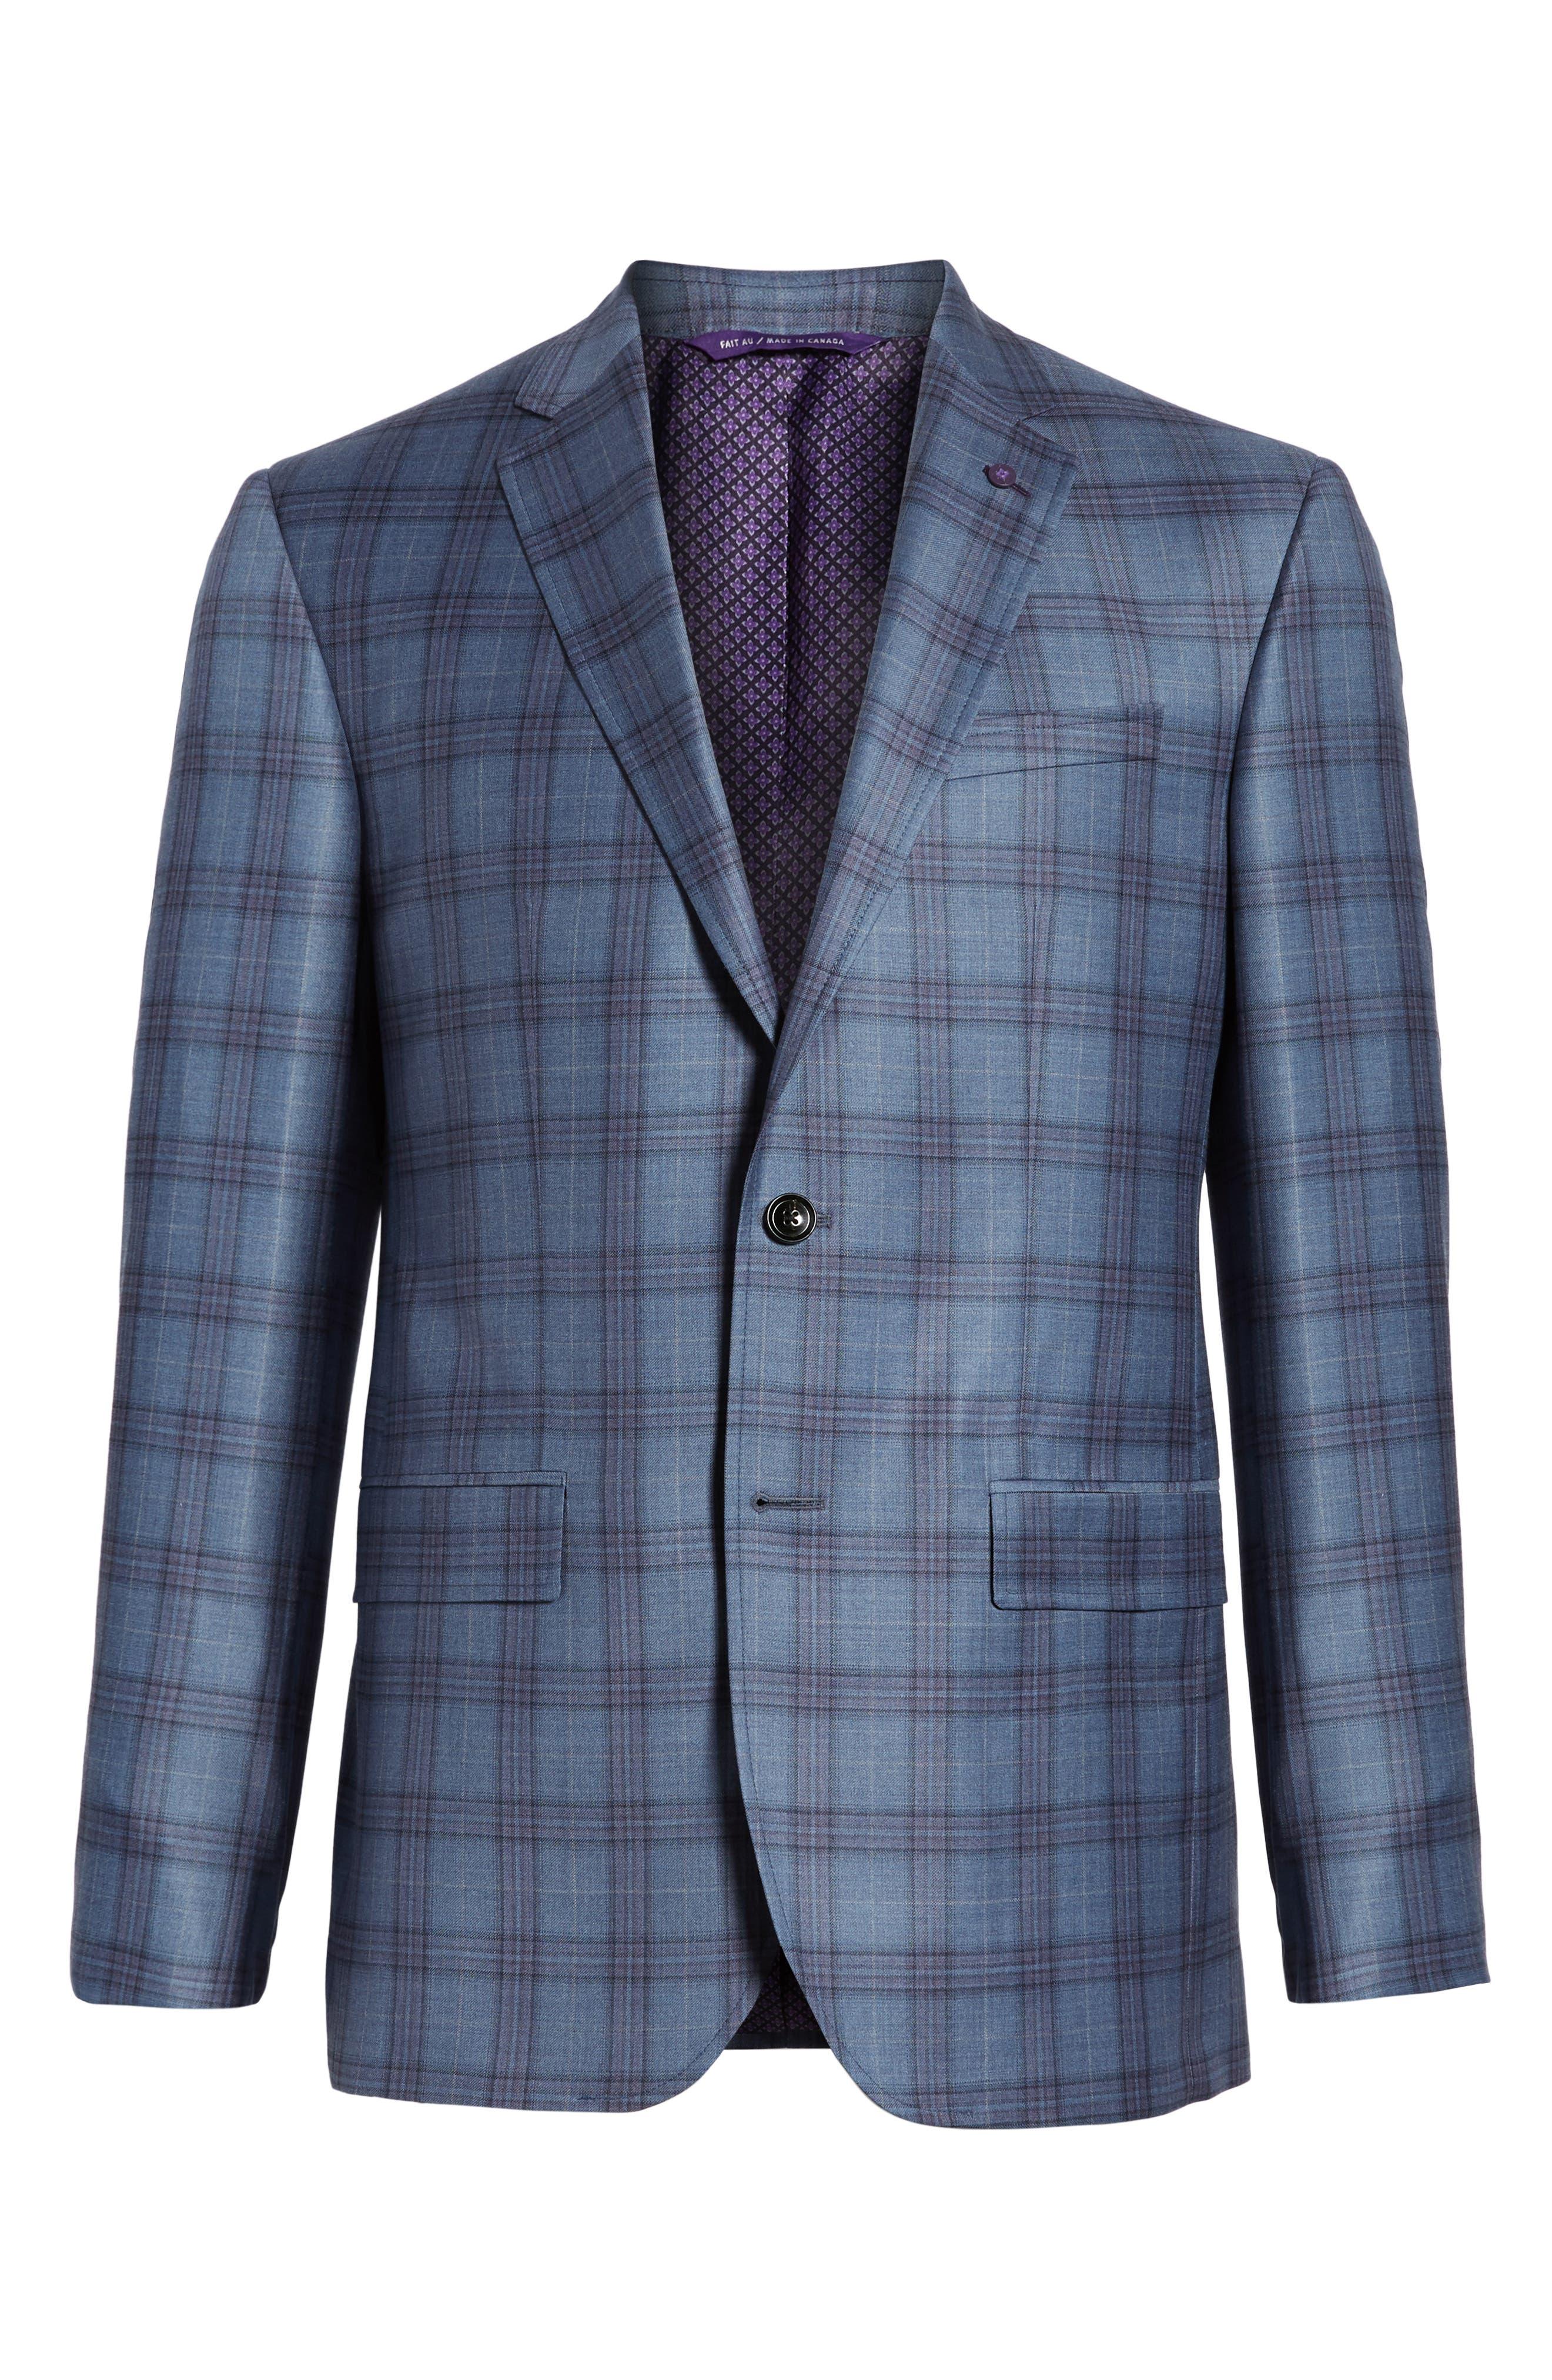 Jay Trim Fit Plaid Wool Sport Coat,                             Alternate thumbnail 6, color,                             Blue